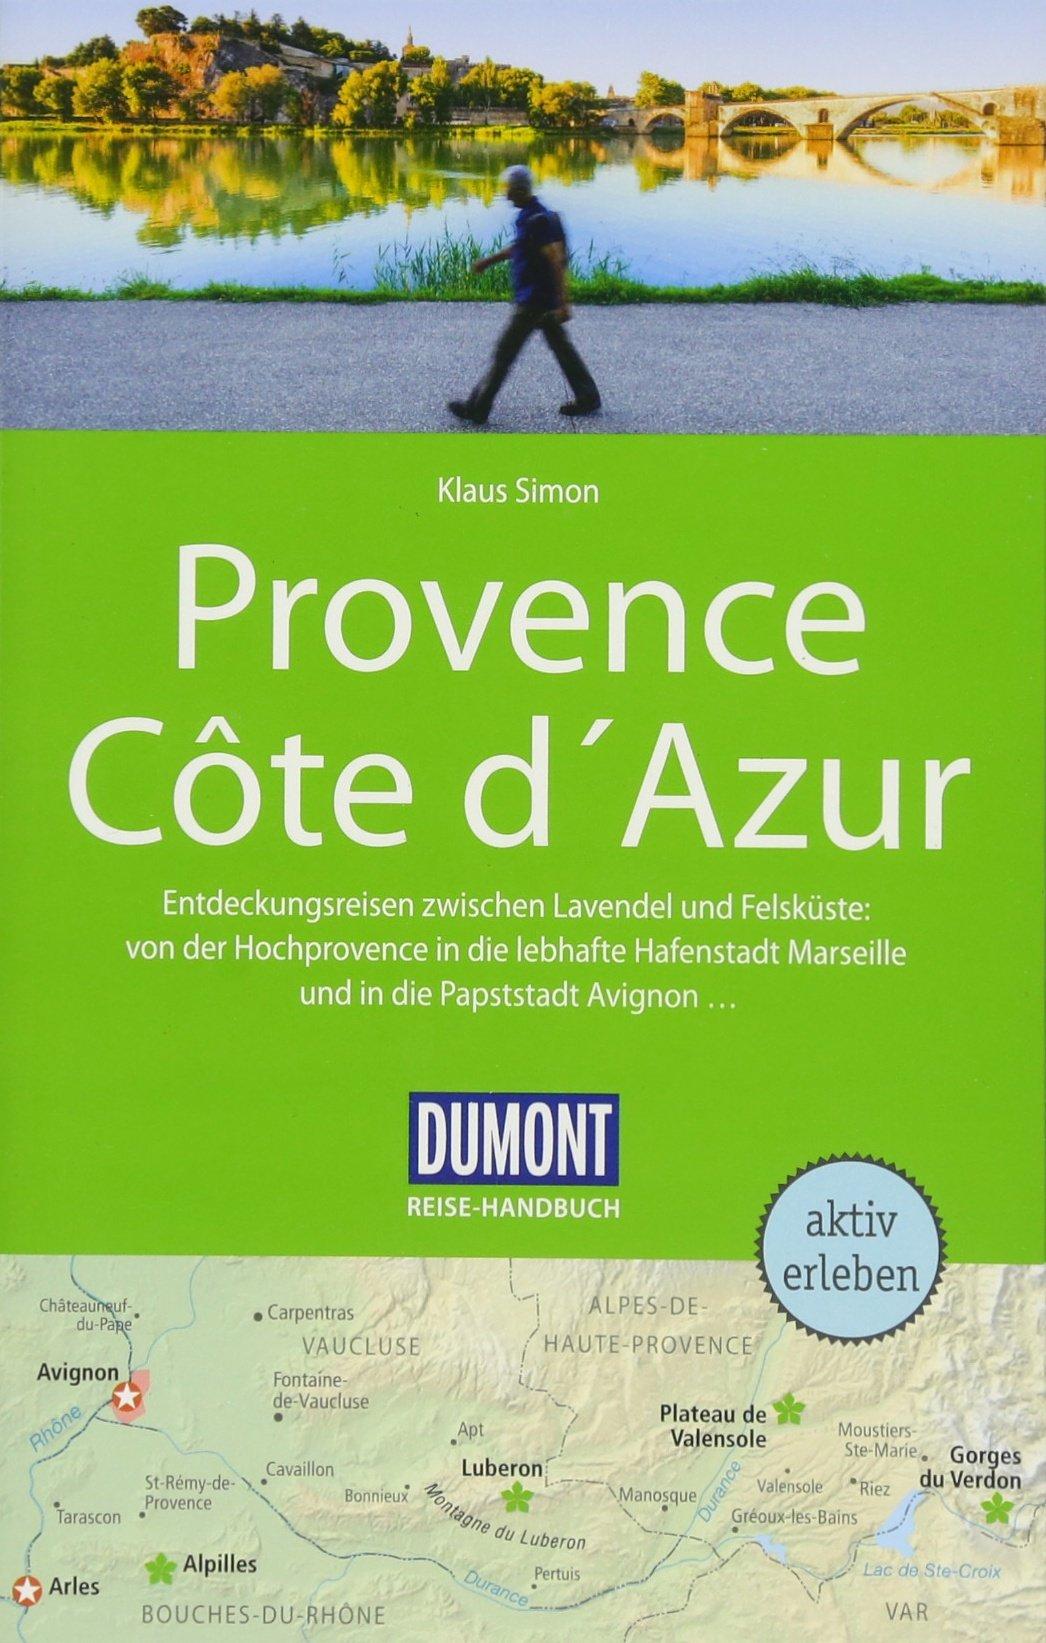 dumont-reise-handbuch-reisefhrer-provence-cte-d-azur-mit-extra-reisekarte